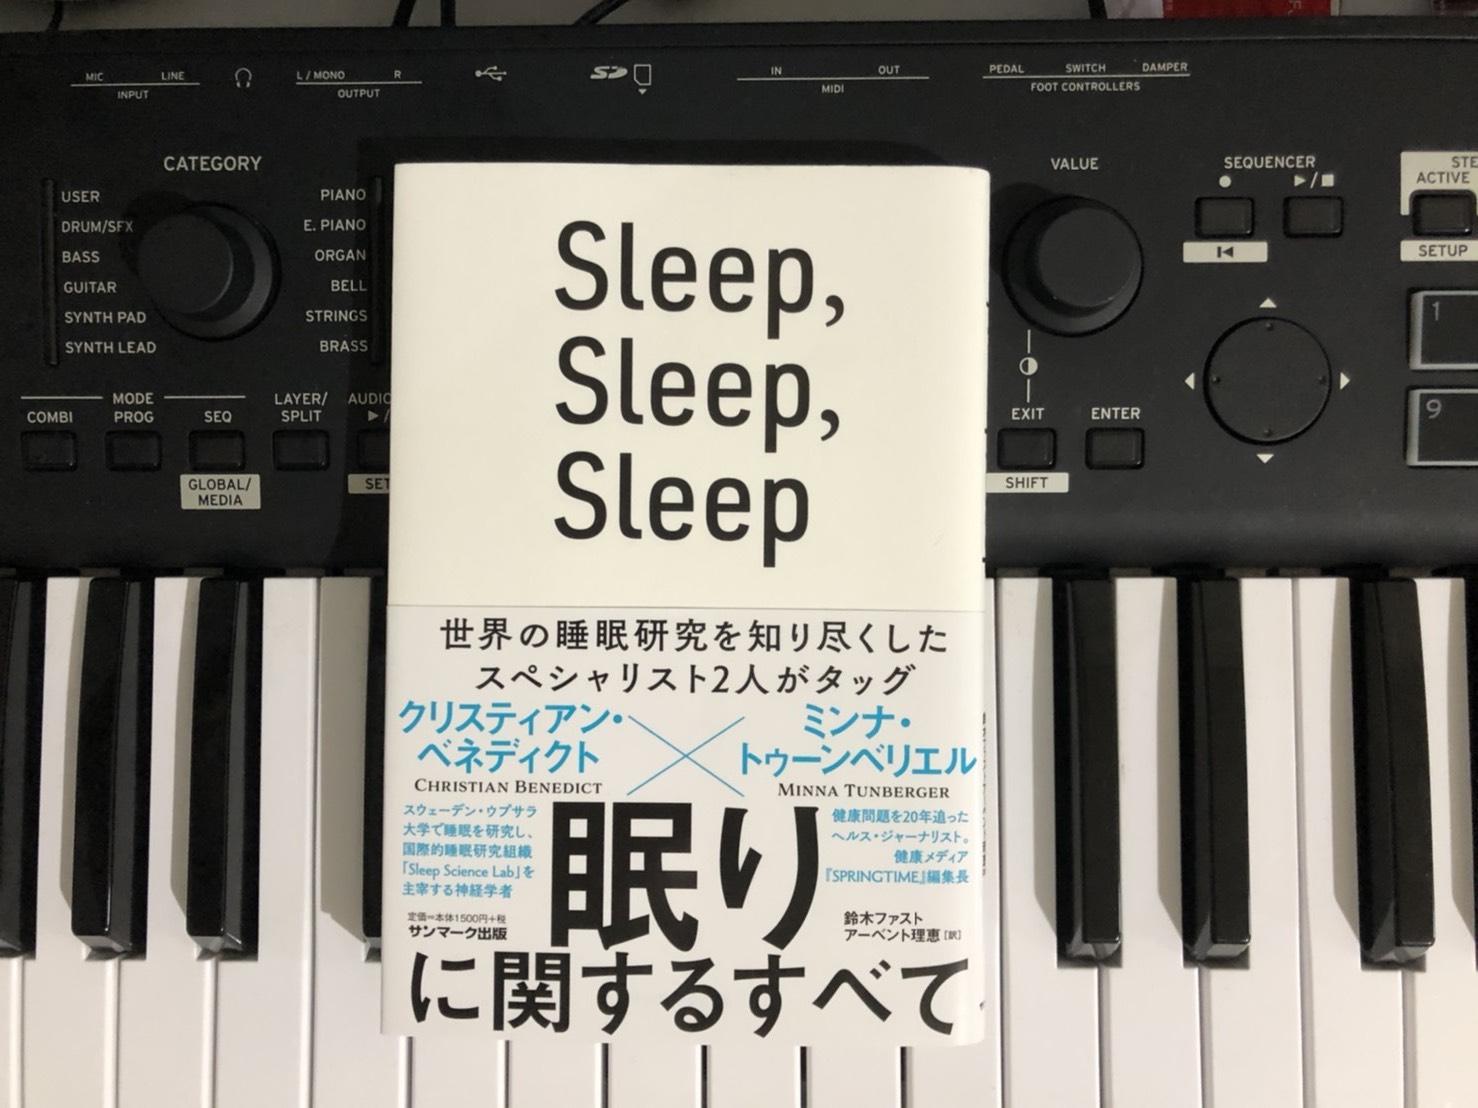 睡眠に関する全て|Sleep,Sleep,Sleep